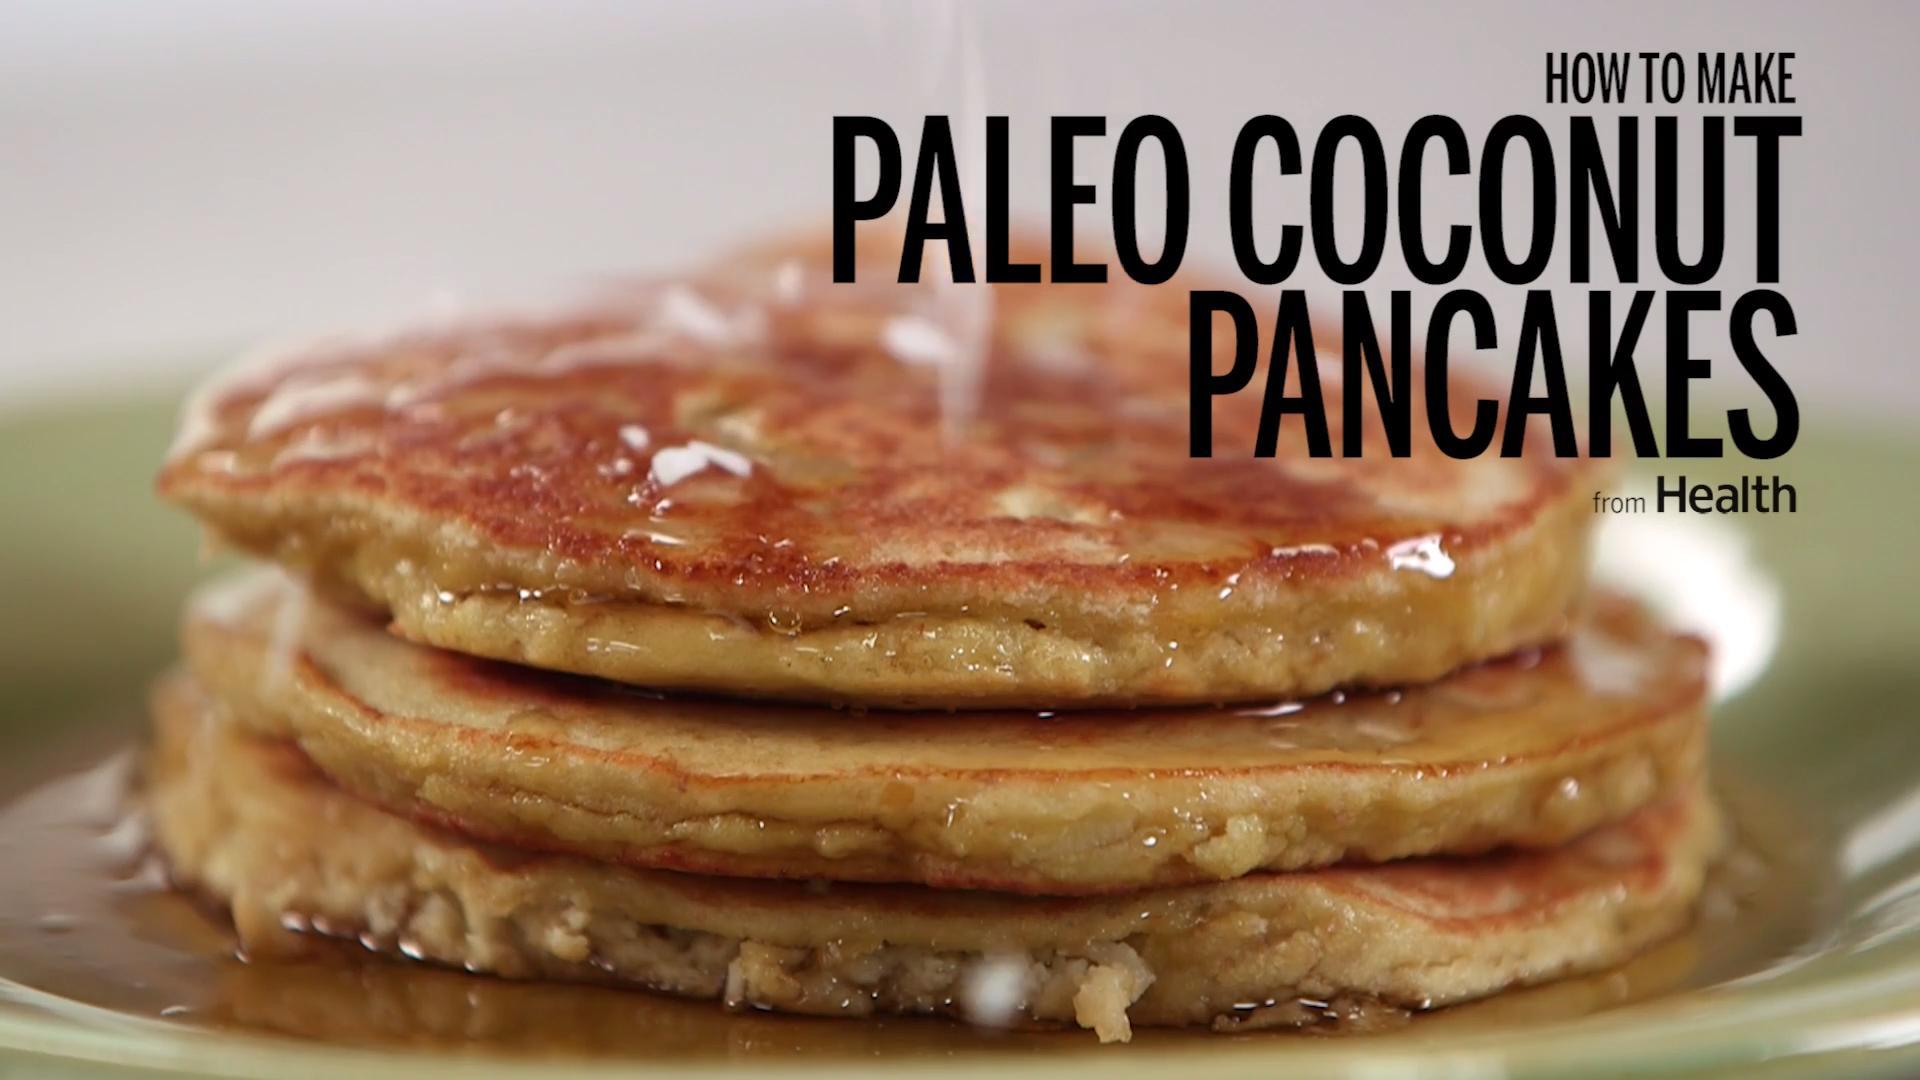 Paleo Coconut Pancakes